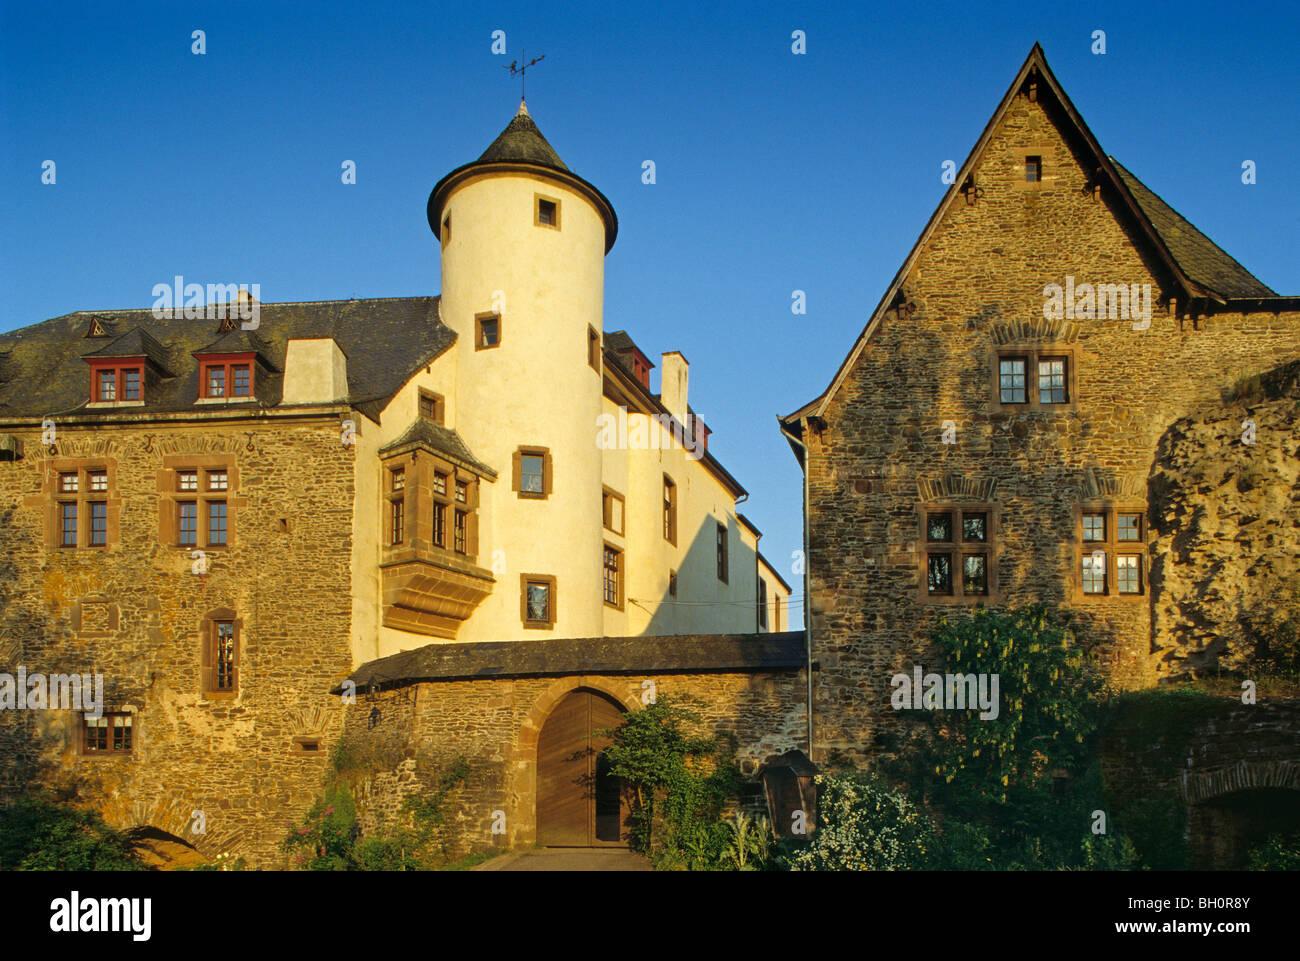 creampie Prüm(Rhineland-Palatinate)